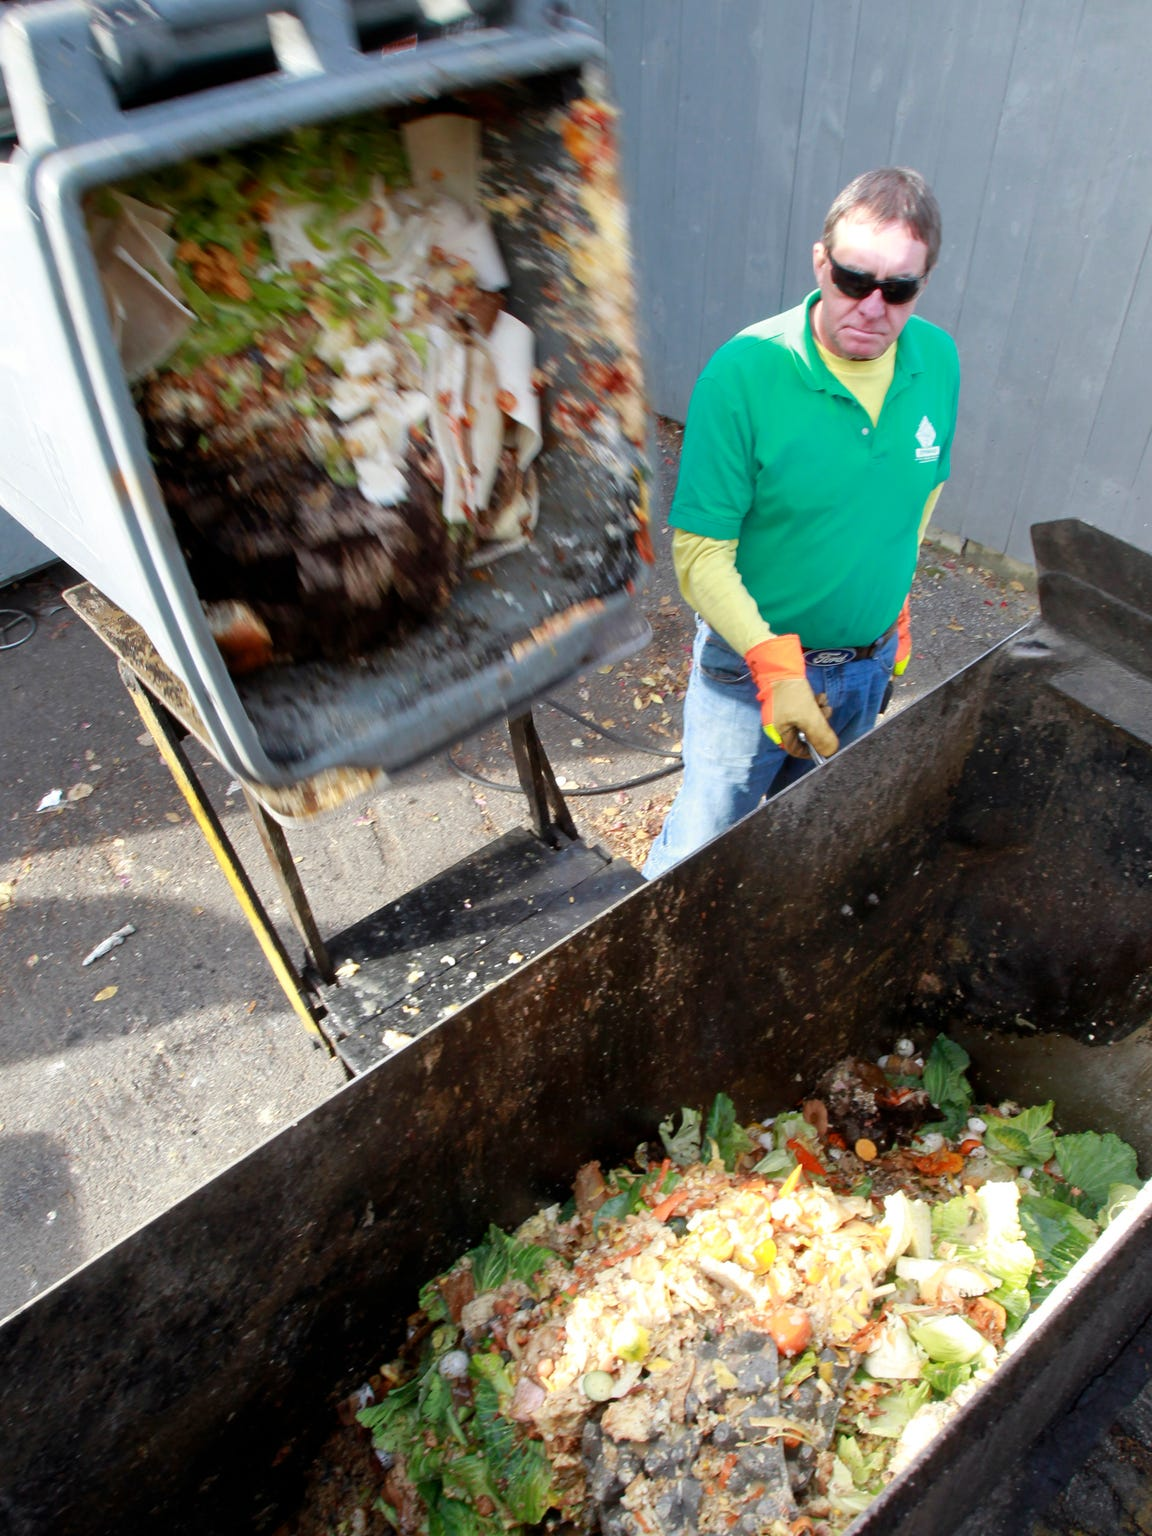 In this Nov. 15, 2013, photo, Bob Freeman loads food